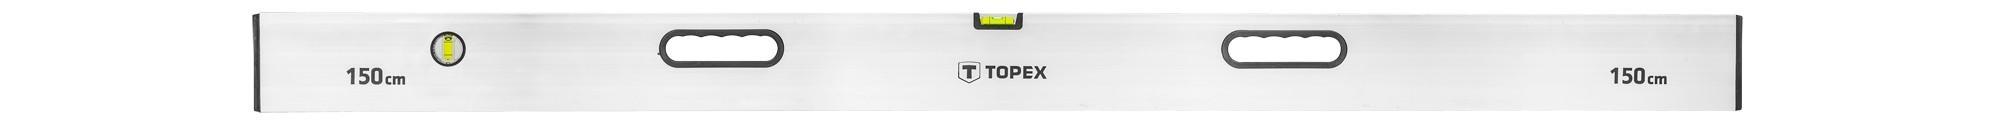 Ölesléc 1500 mm fogólyukkal | TOPEX 29C142